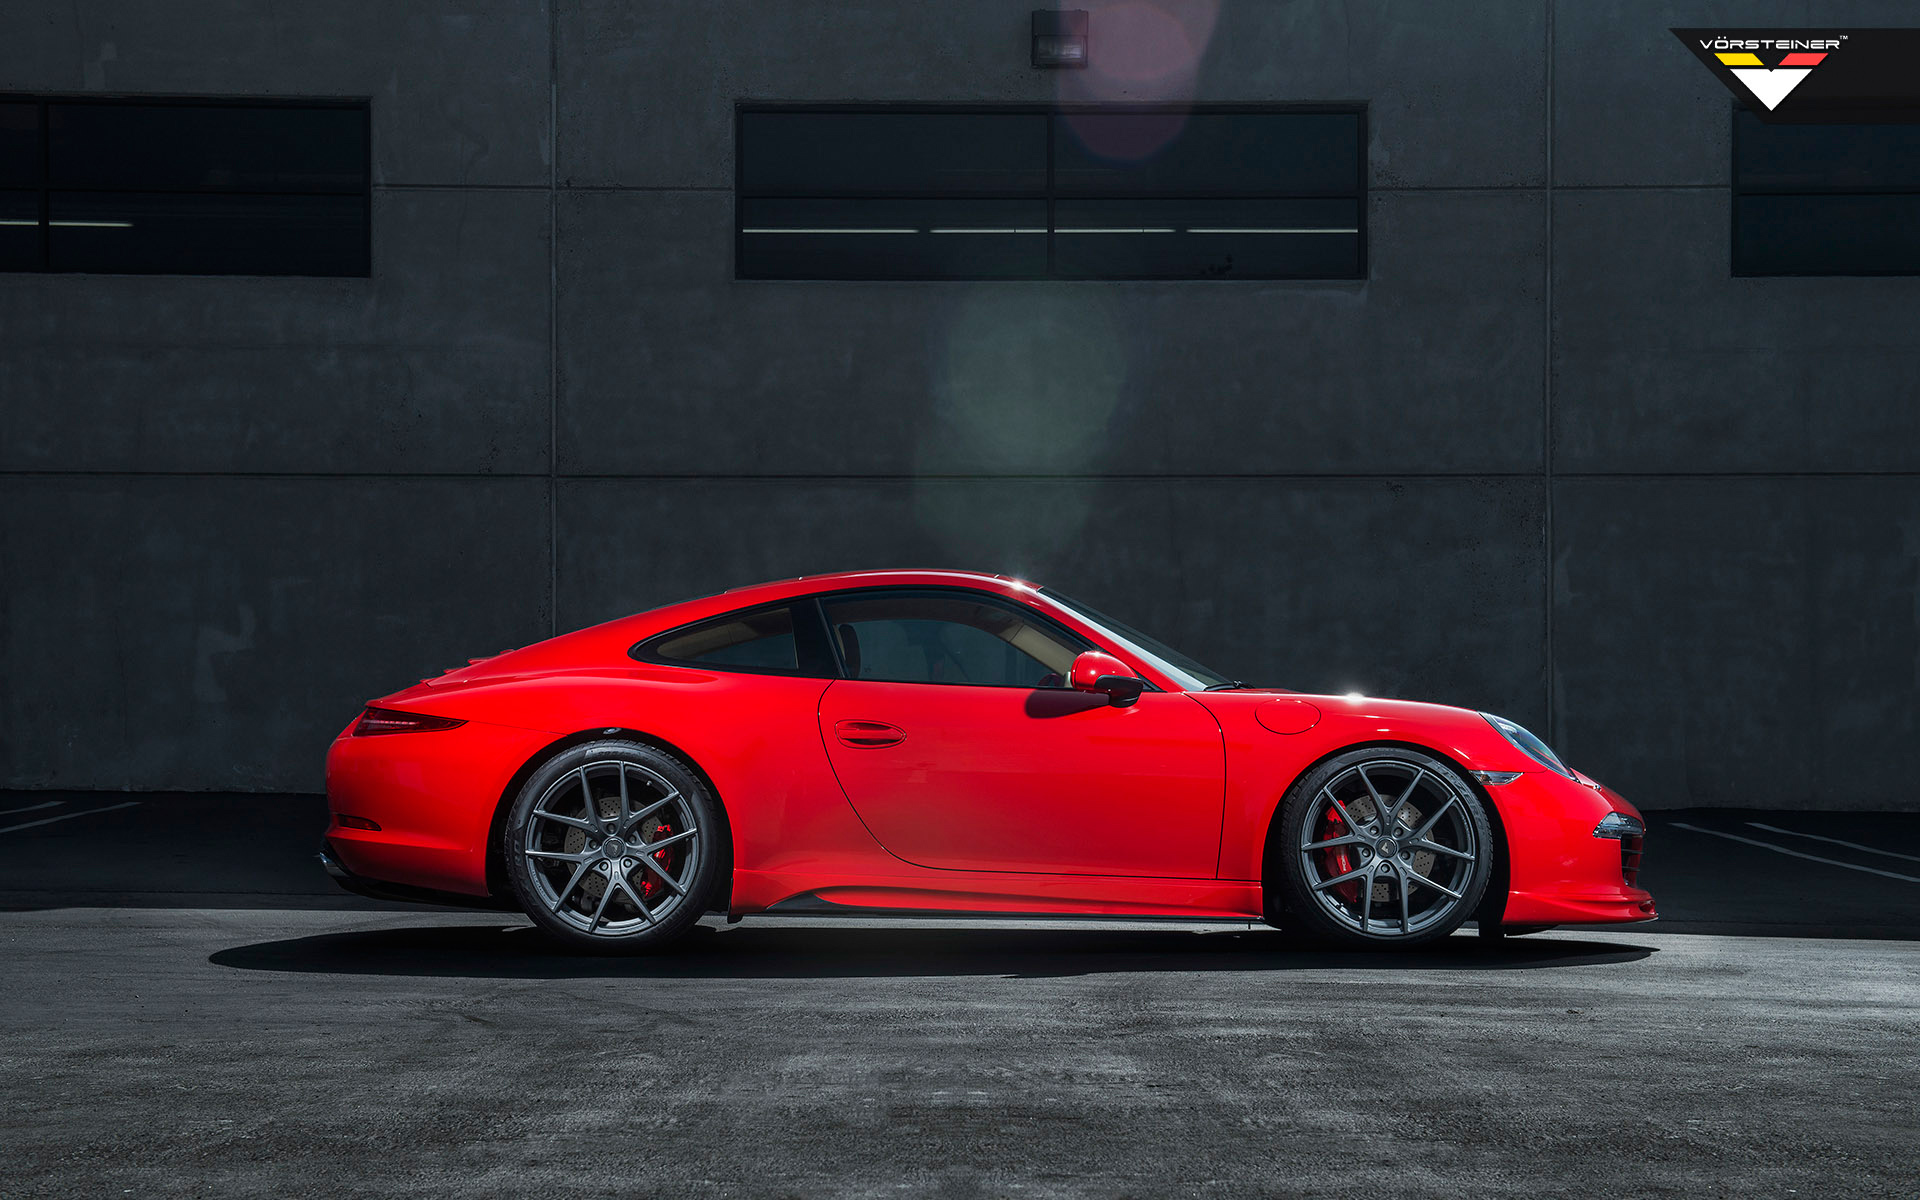 Porsche 991 Carrera S V Gt Edition Fondo De Pantalla Hd